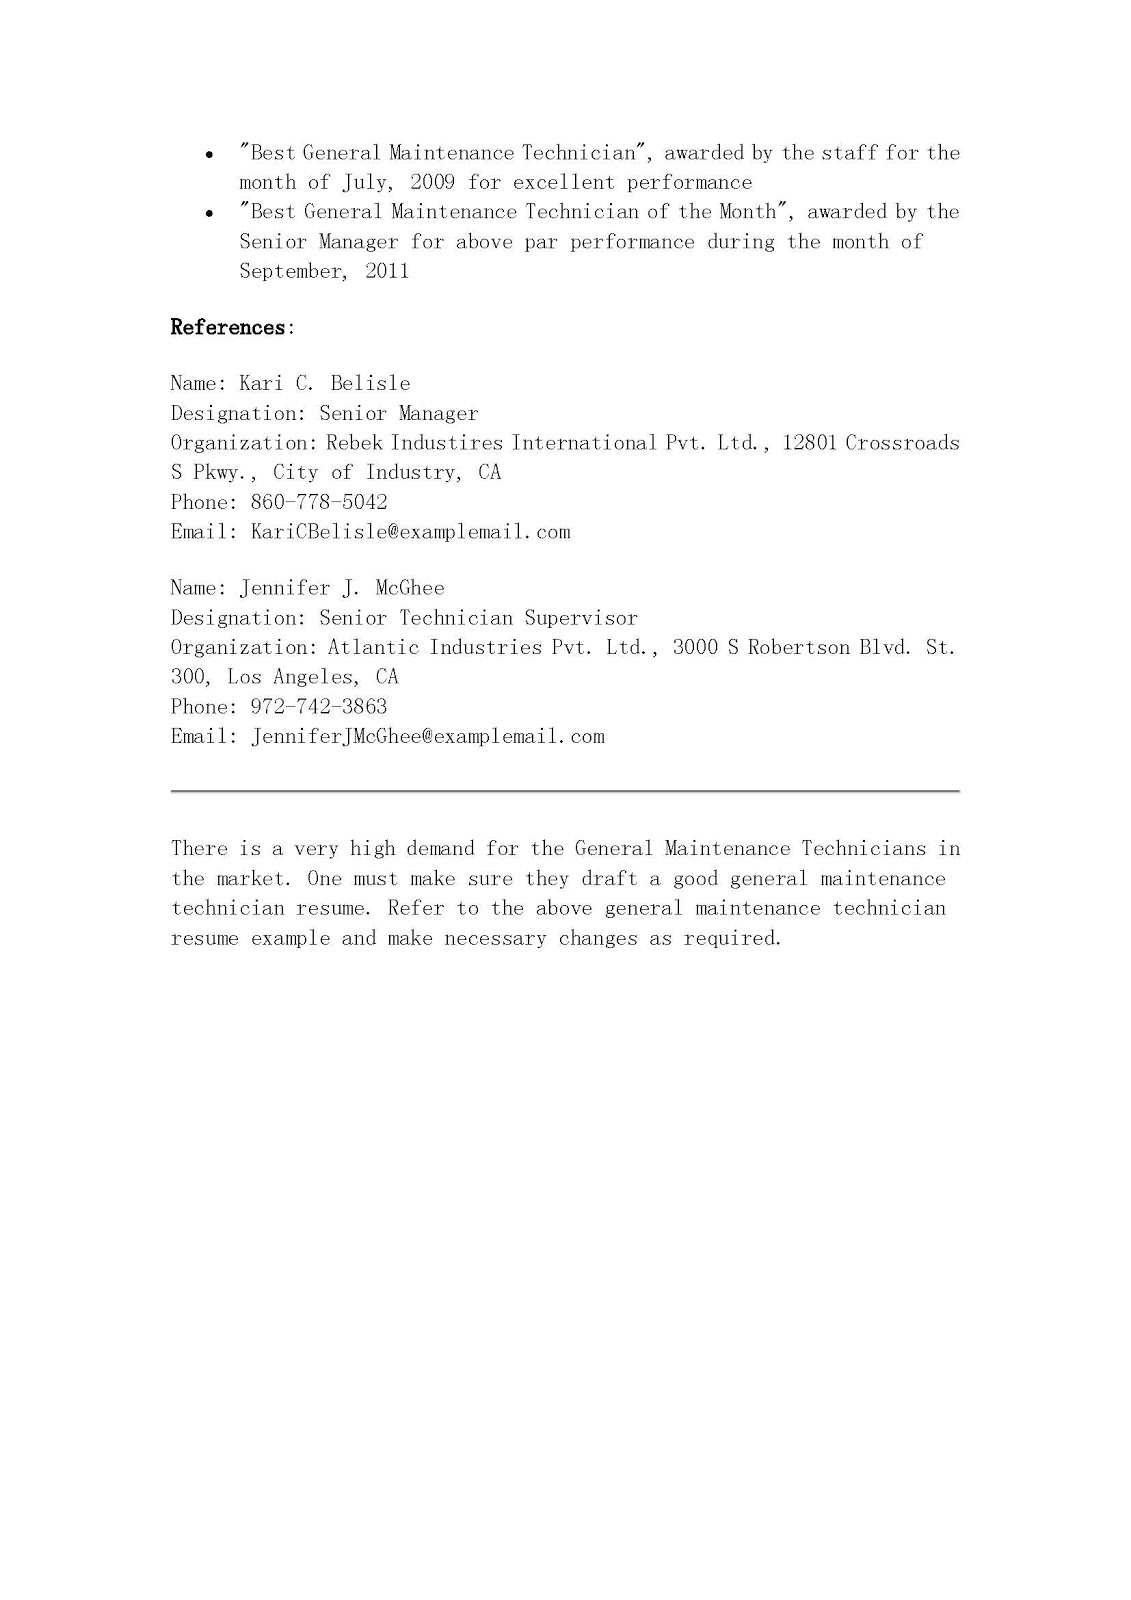 general maintenance technician sample resume